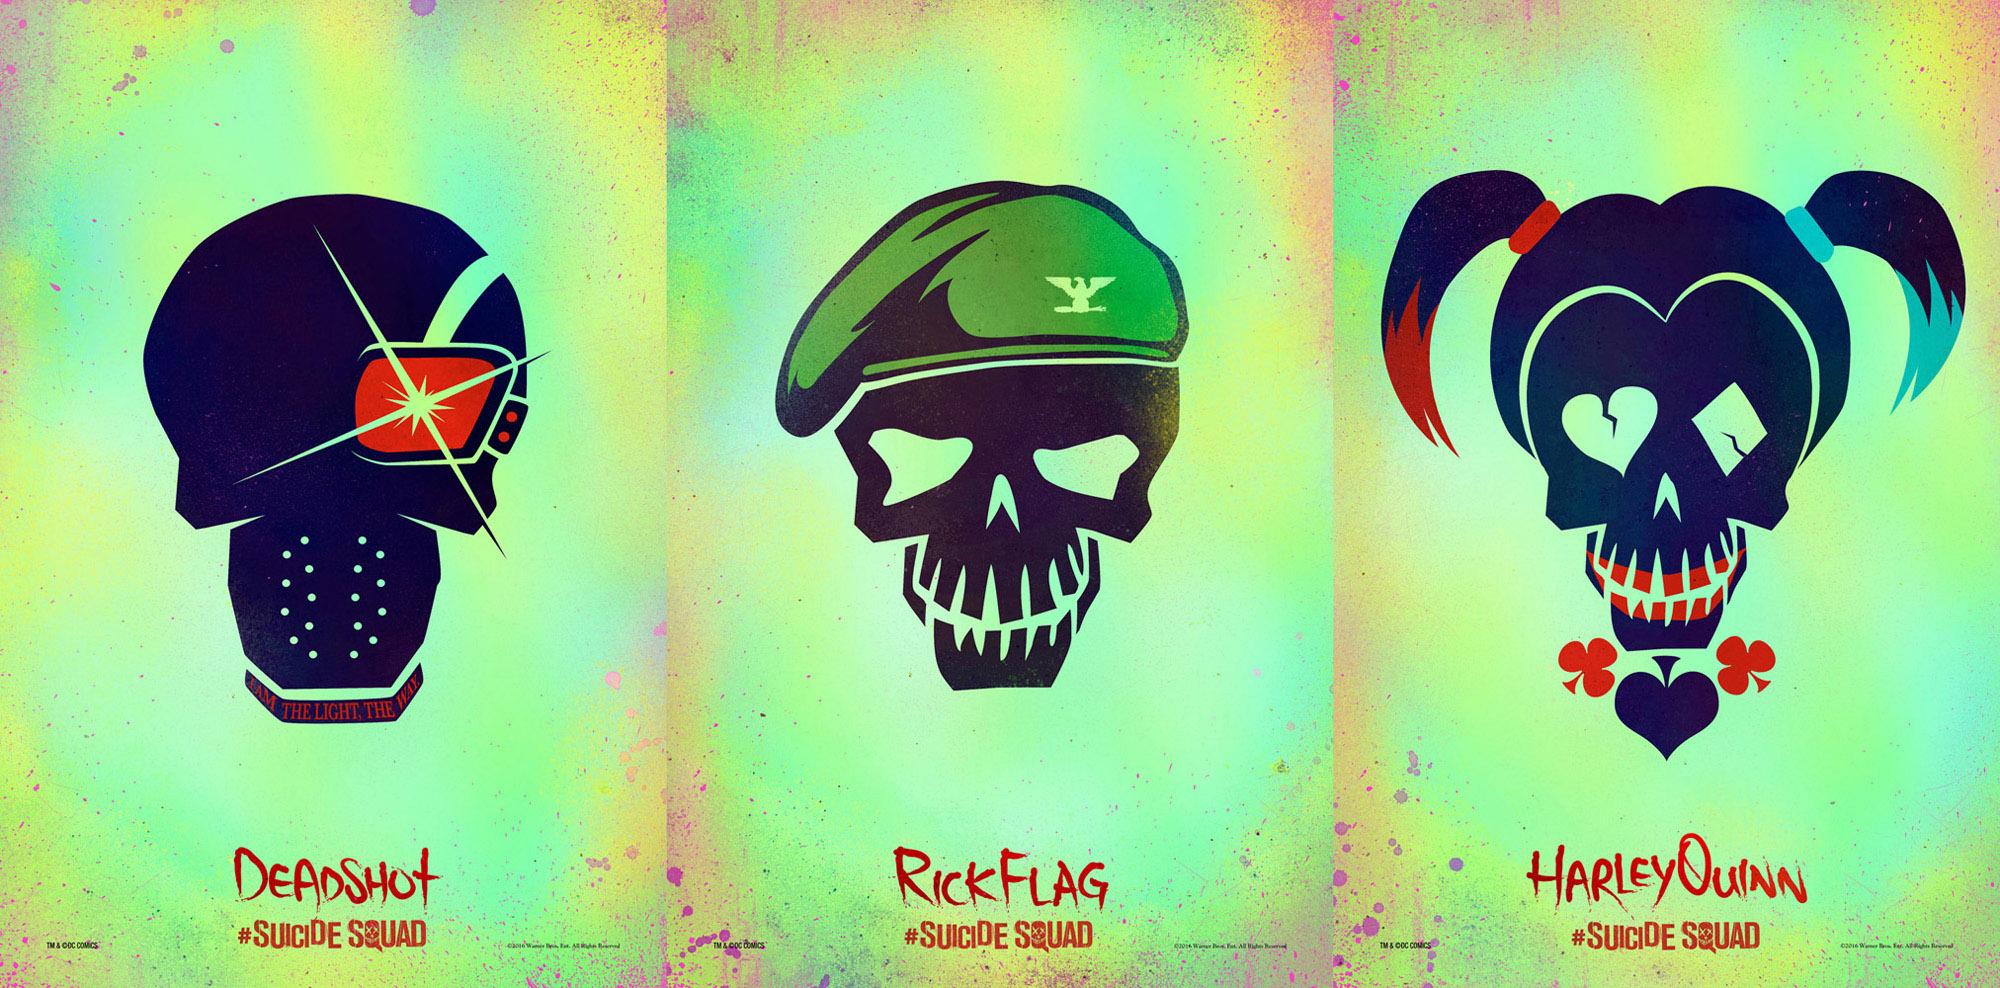 SUISQ_Deadshot_RickFlagg-HarleyQuinn